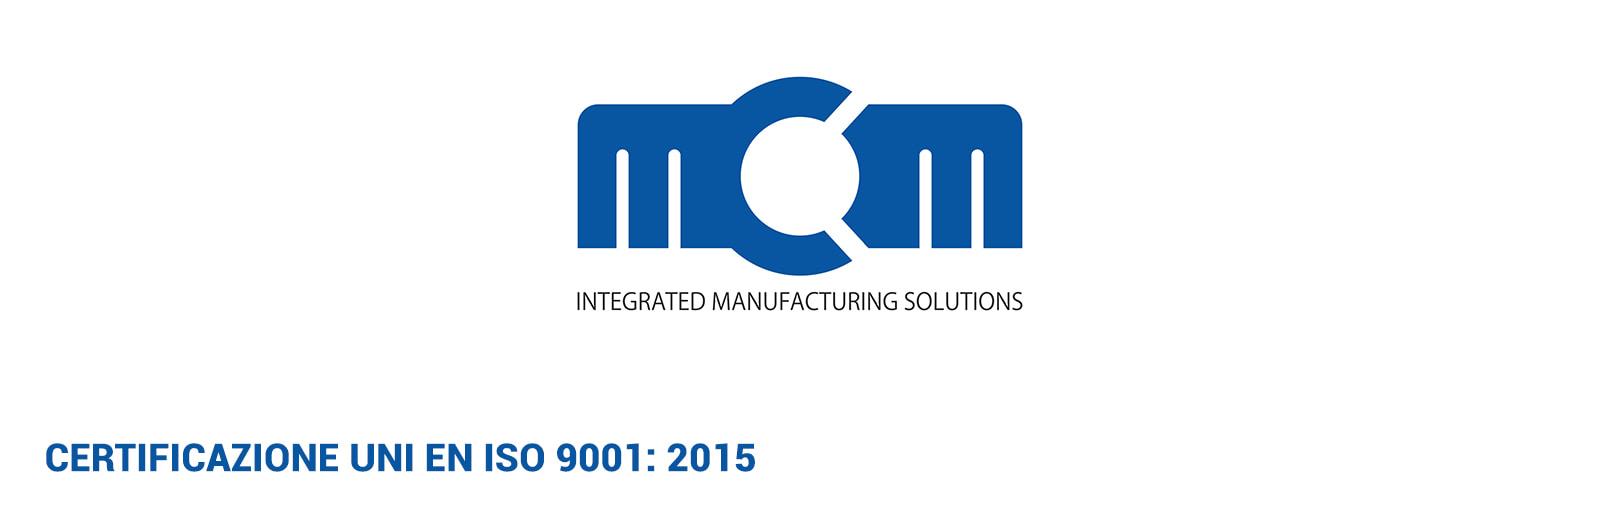 Case Study MCM SpA – CERTIFICAZIONE UNI EN ISO 9001: 2015